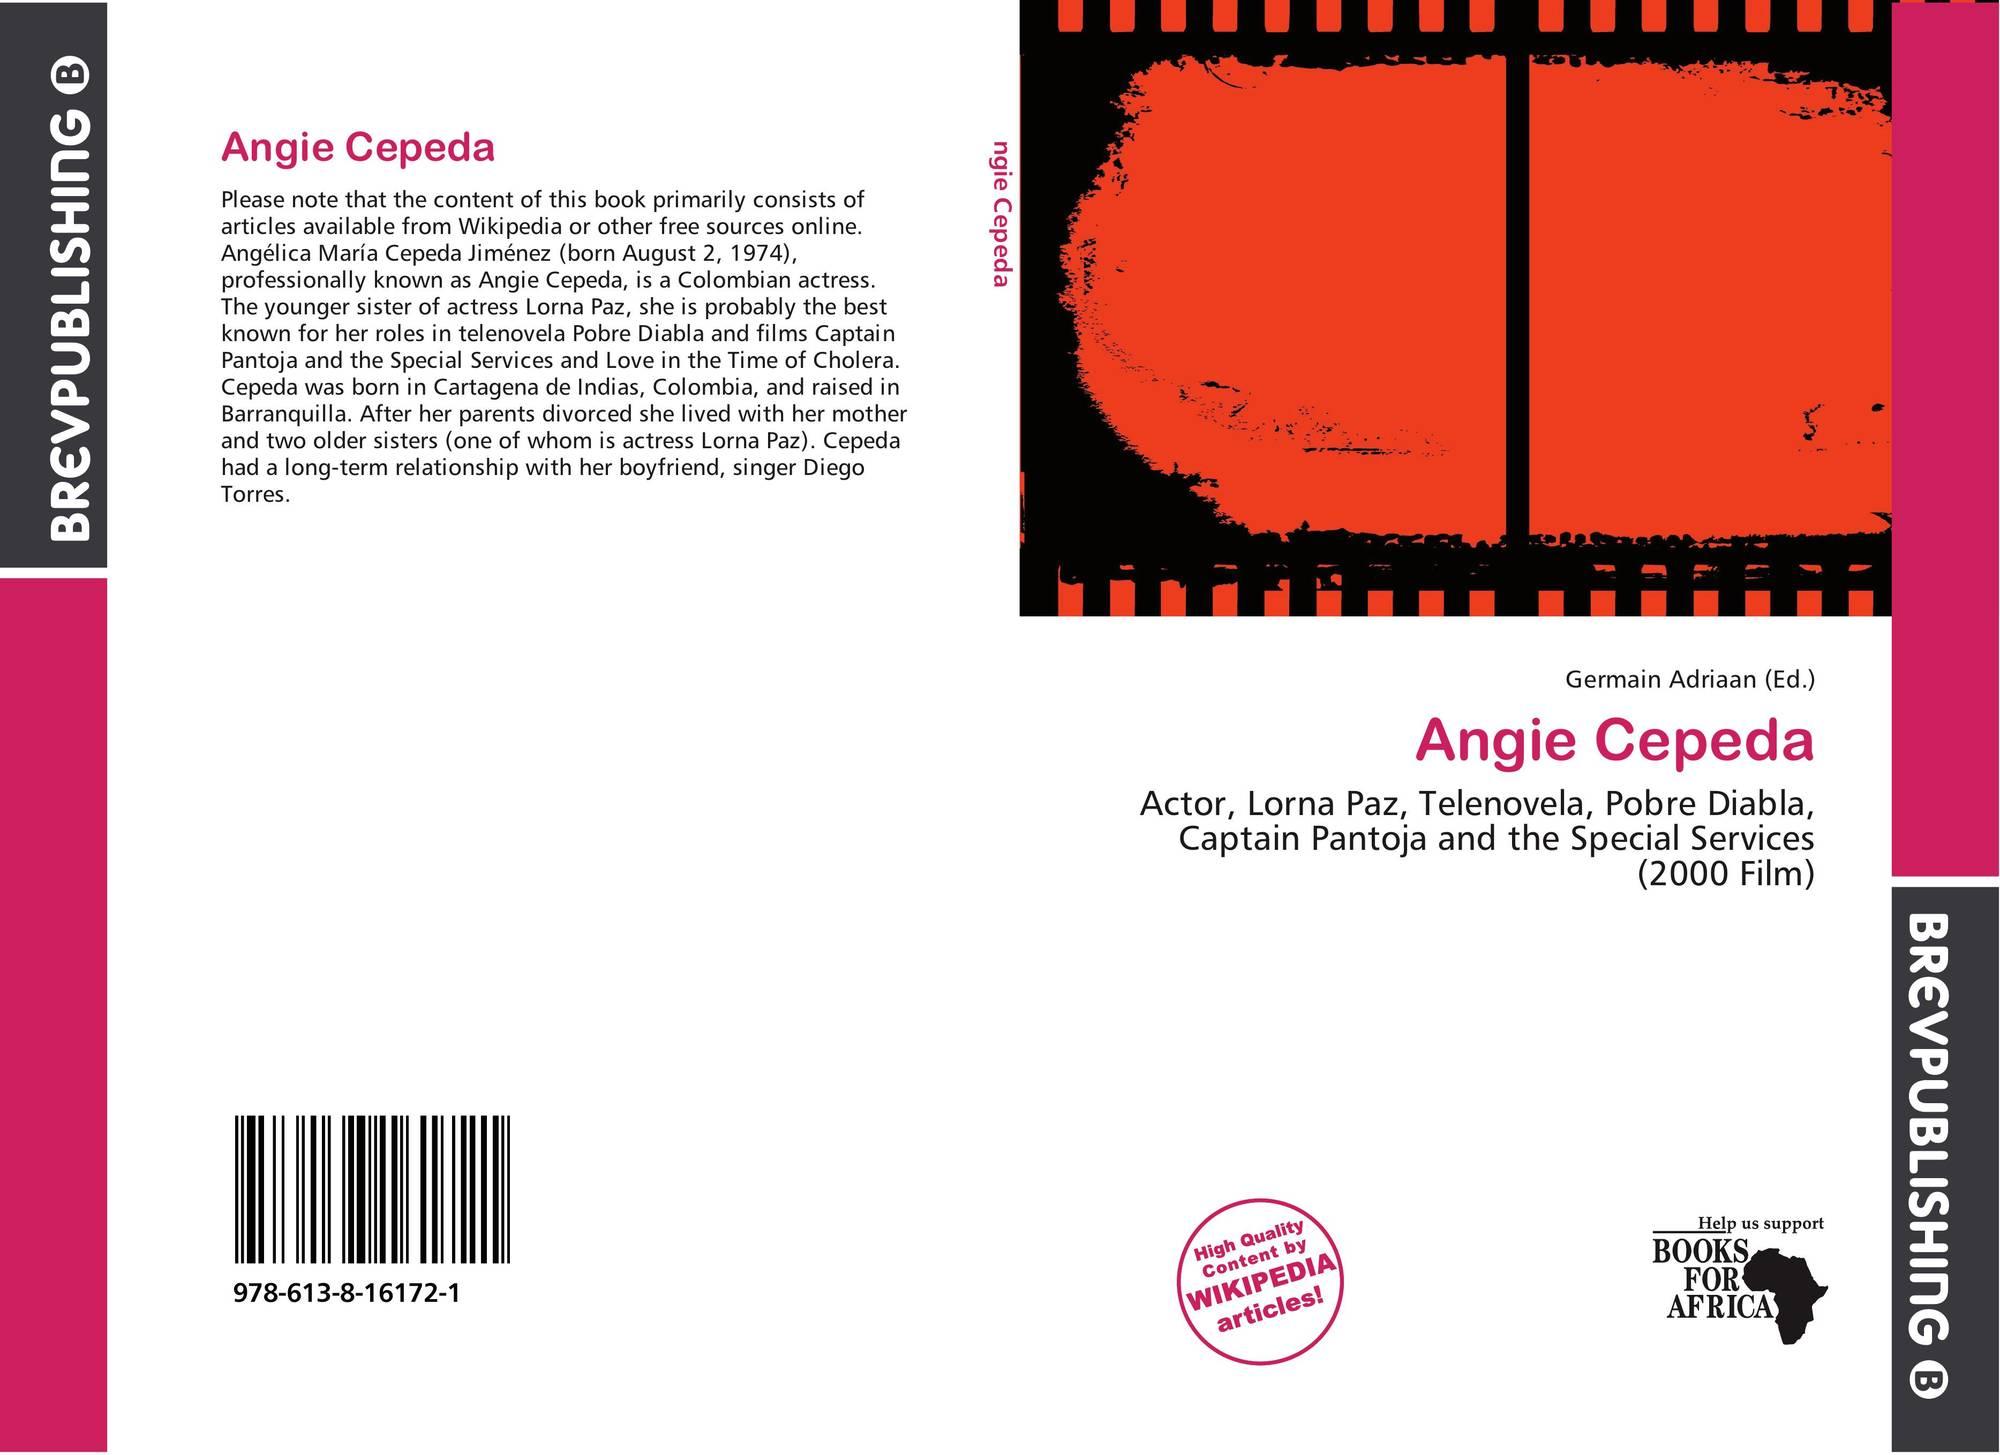 Angelica Maria Cepeda Jimenez angie cepeda, 978-613-8-16172-1, 6138161726 ,9786138161721